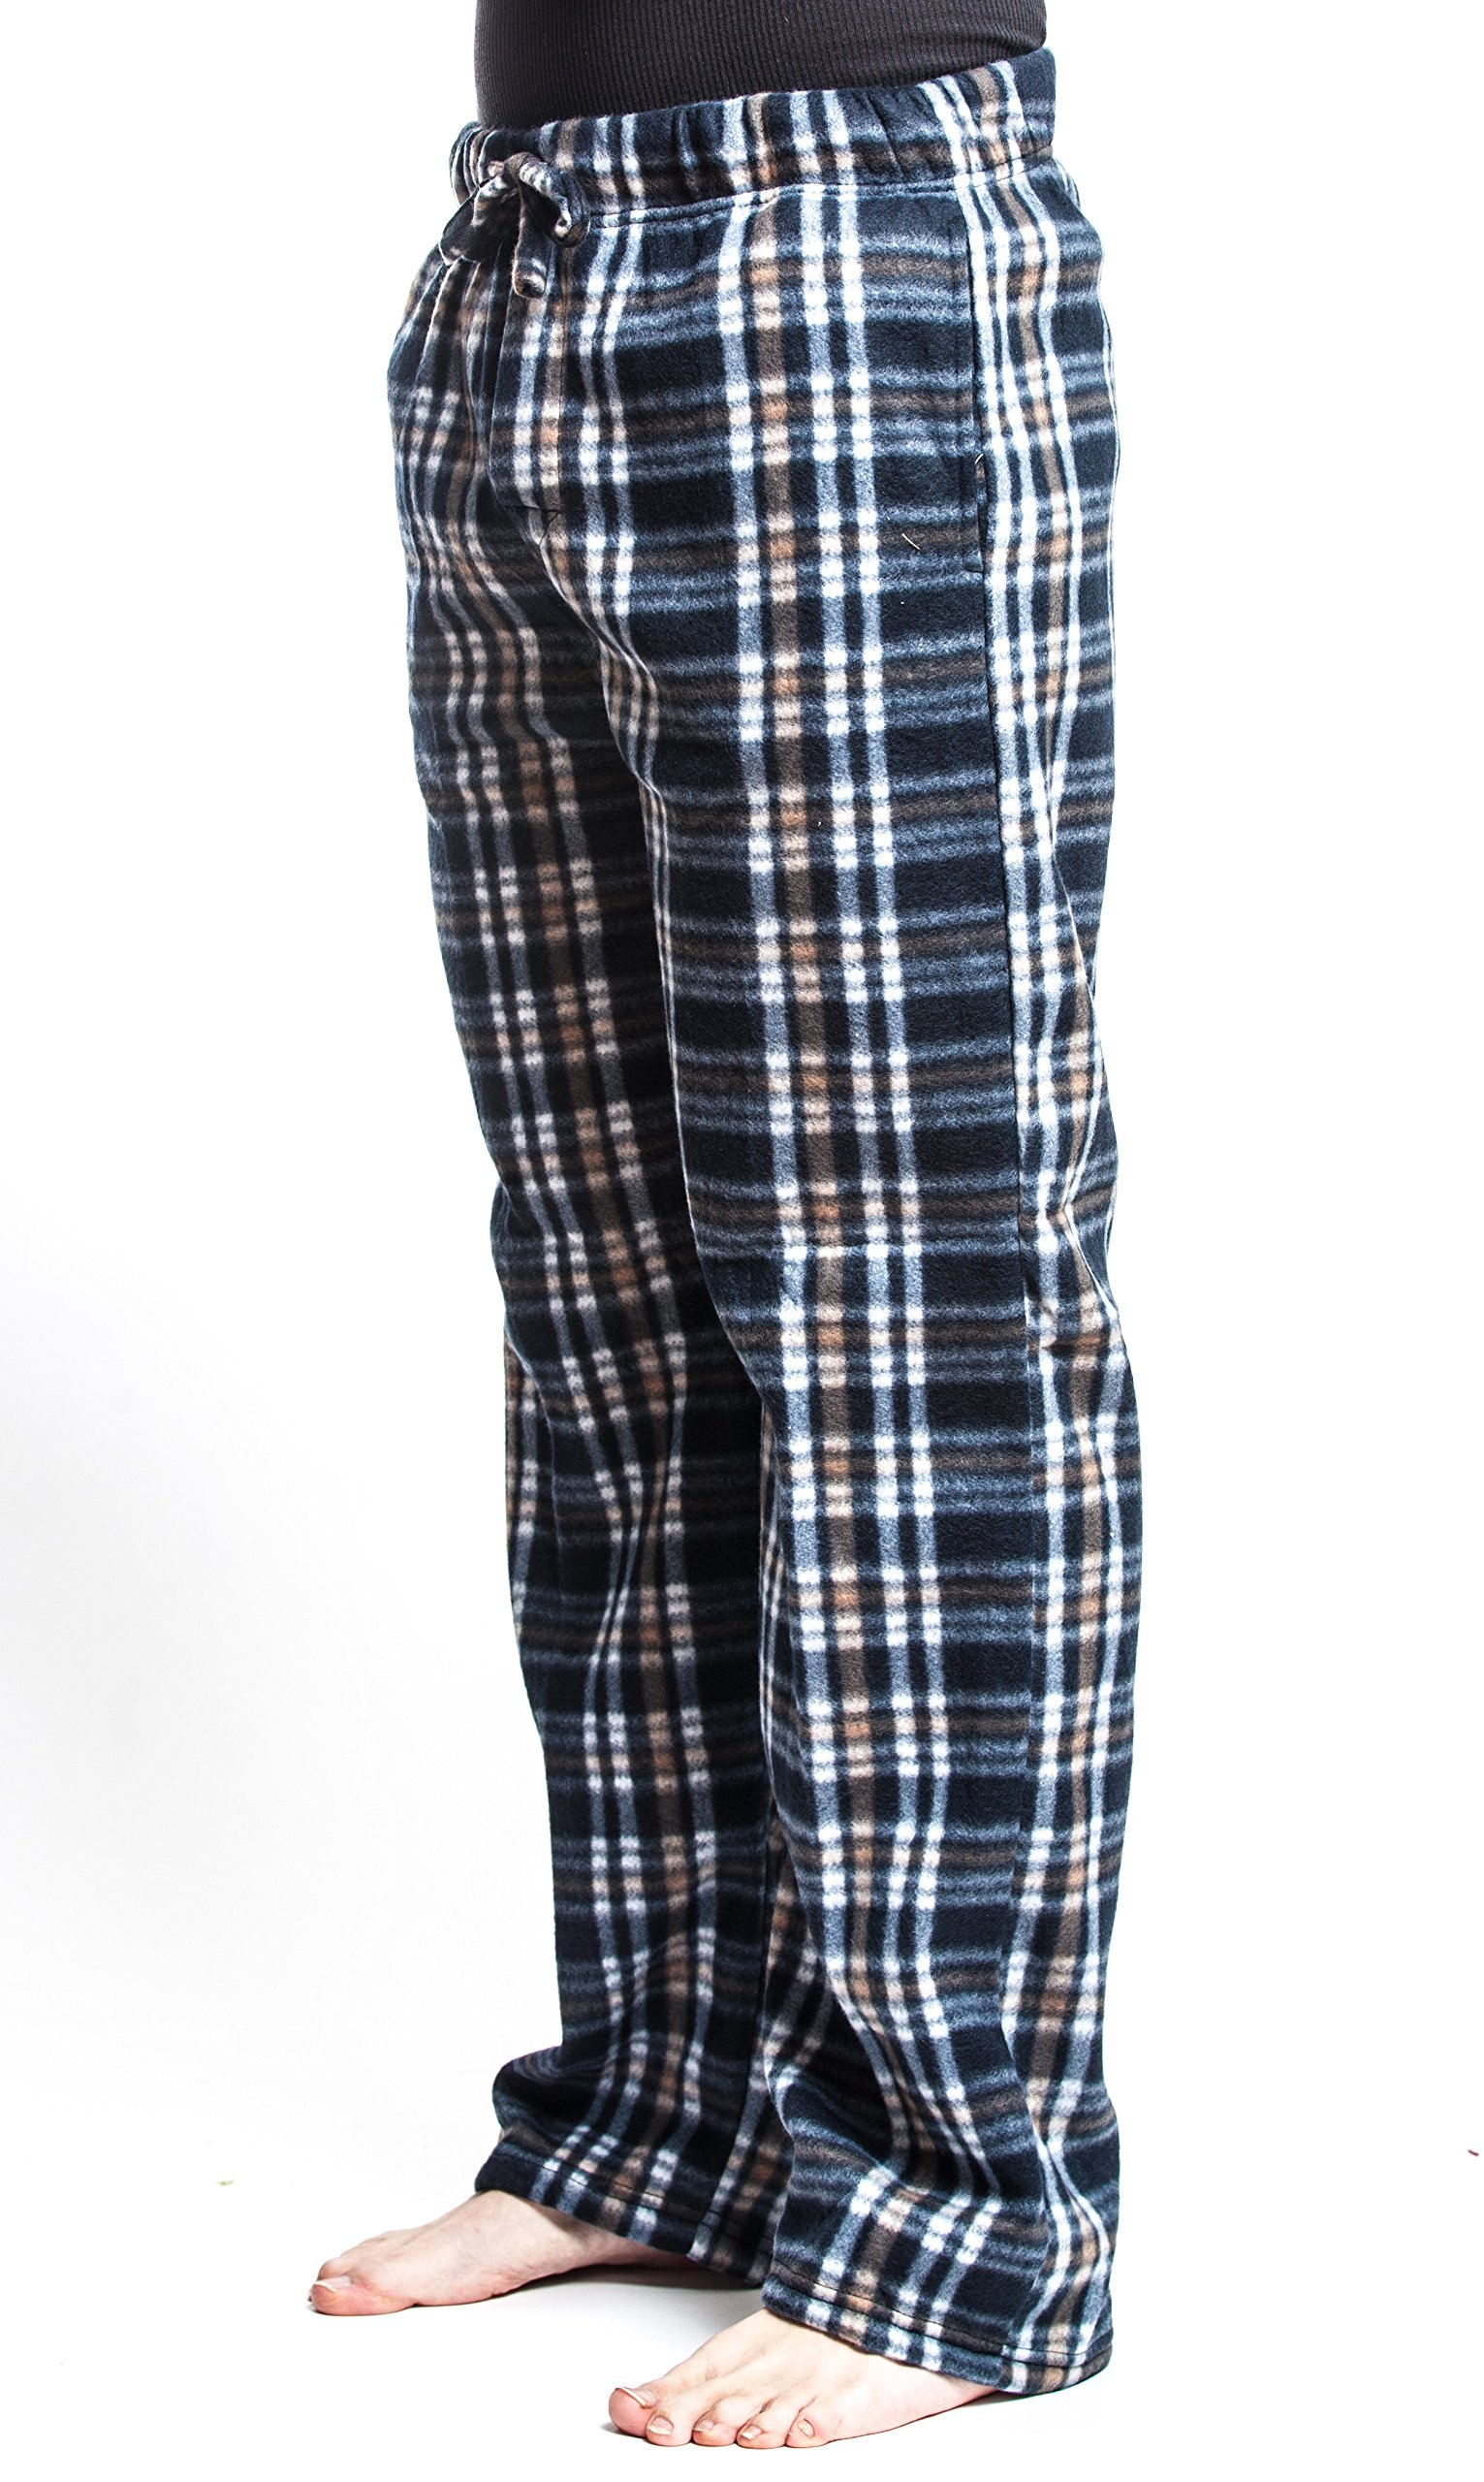 Men's Flannel Fleece Brush Pajama Sleep & Lounge Pants (Medium, Black) …